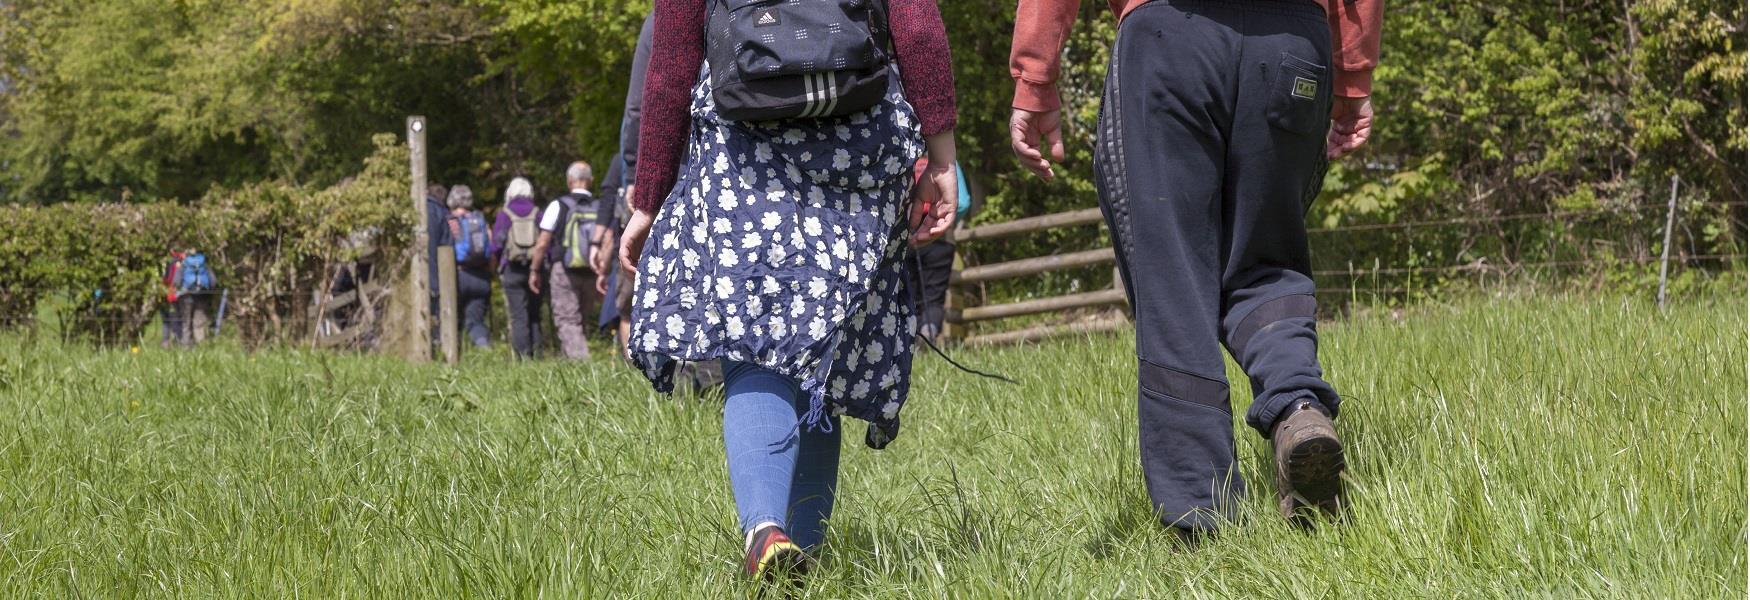 Chesterfield Area Walking Festival